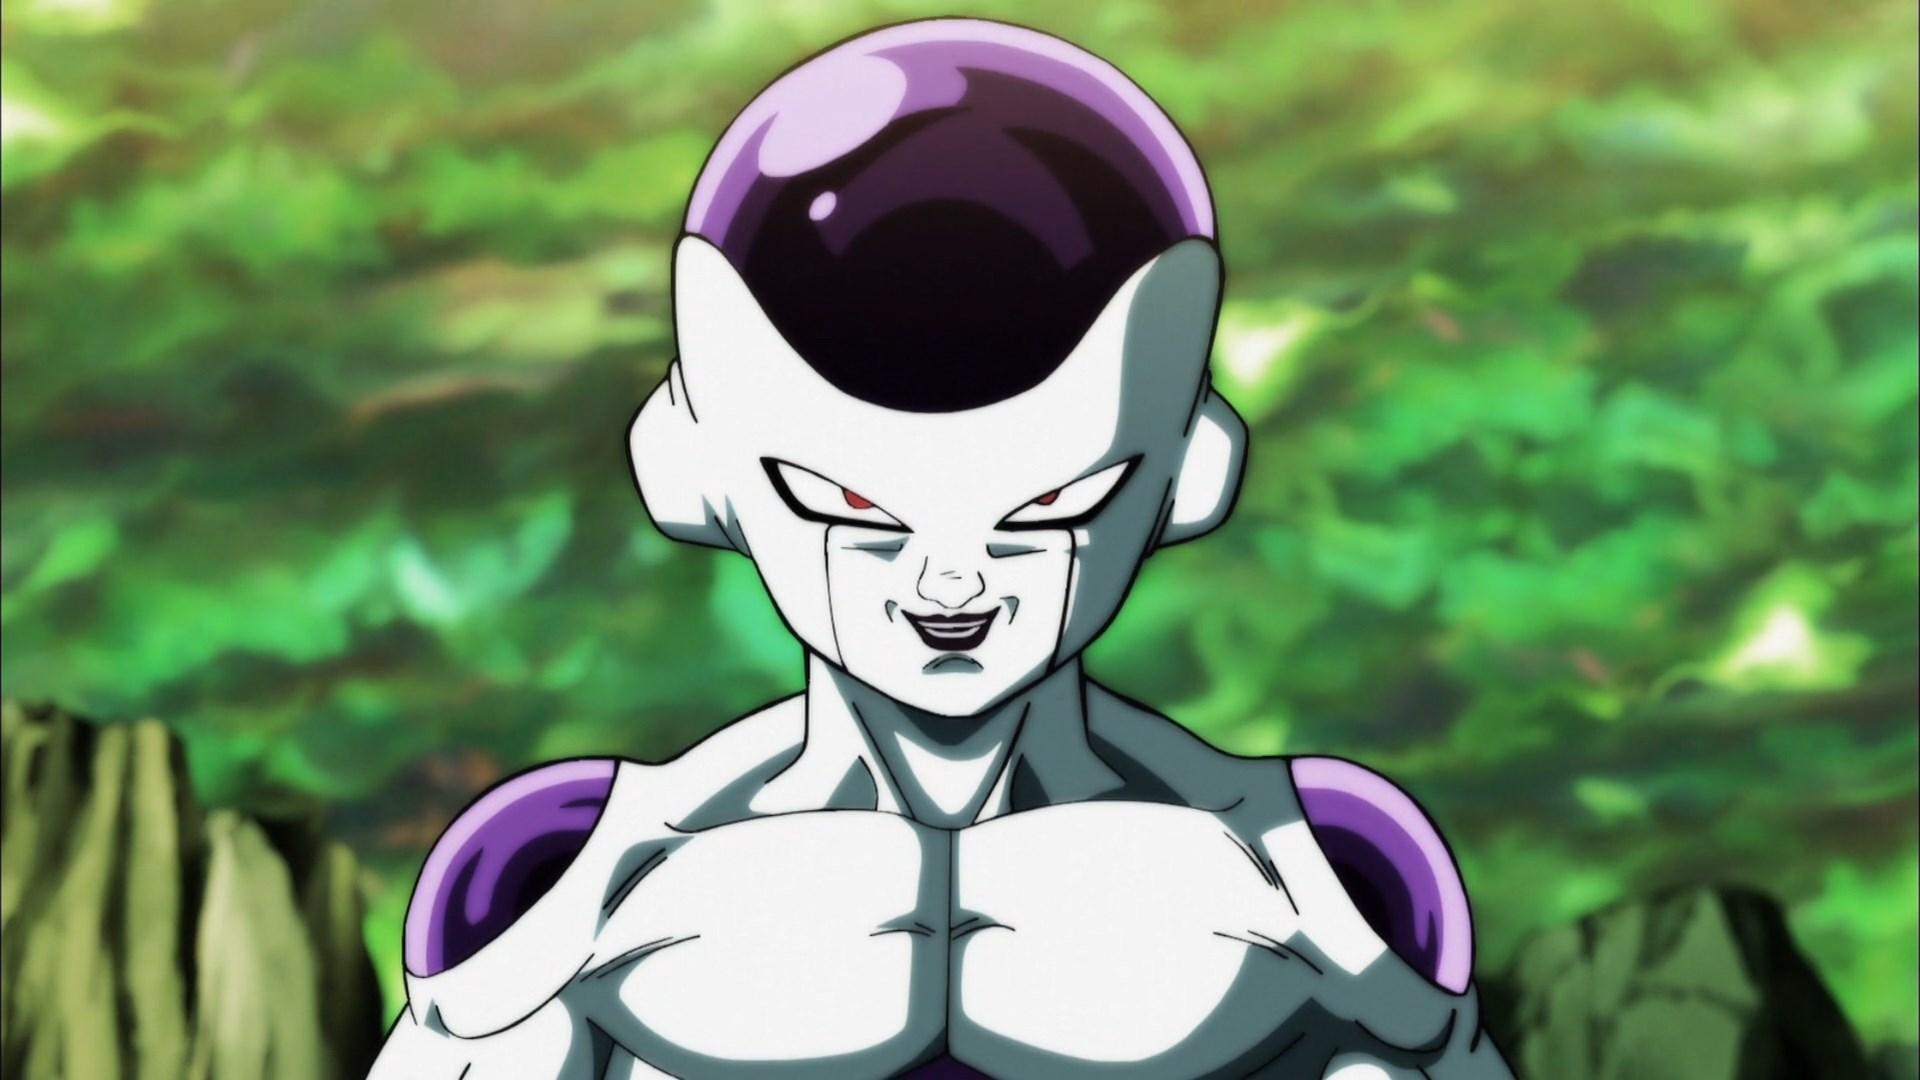 [HorribleSubs] Dragon Ball Super - 121 [1080p].mkv_snapshot_11.51